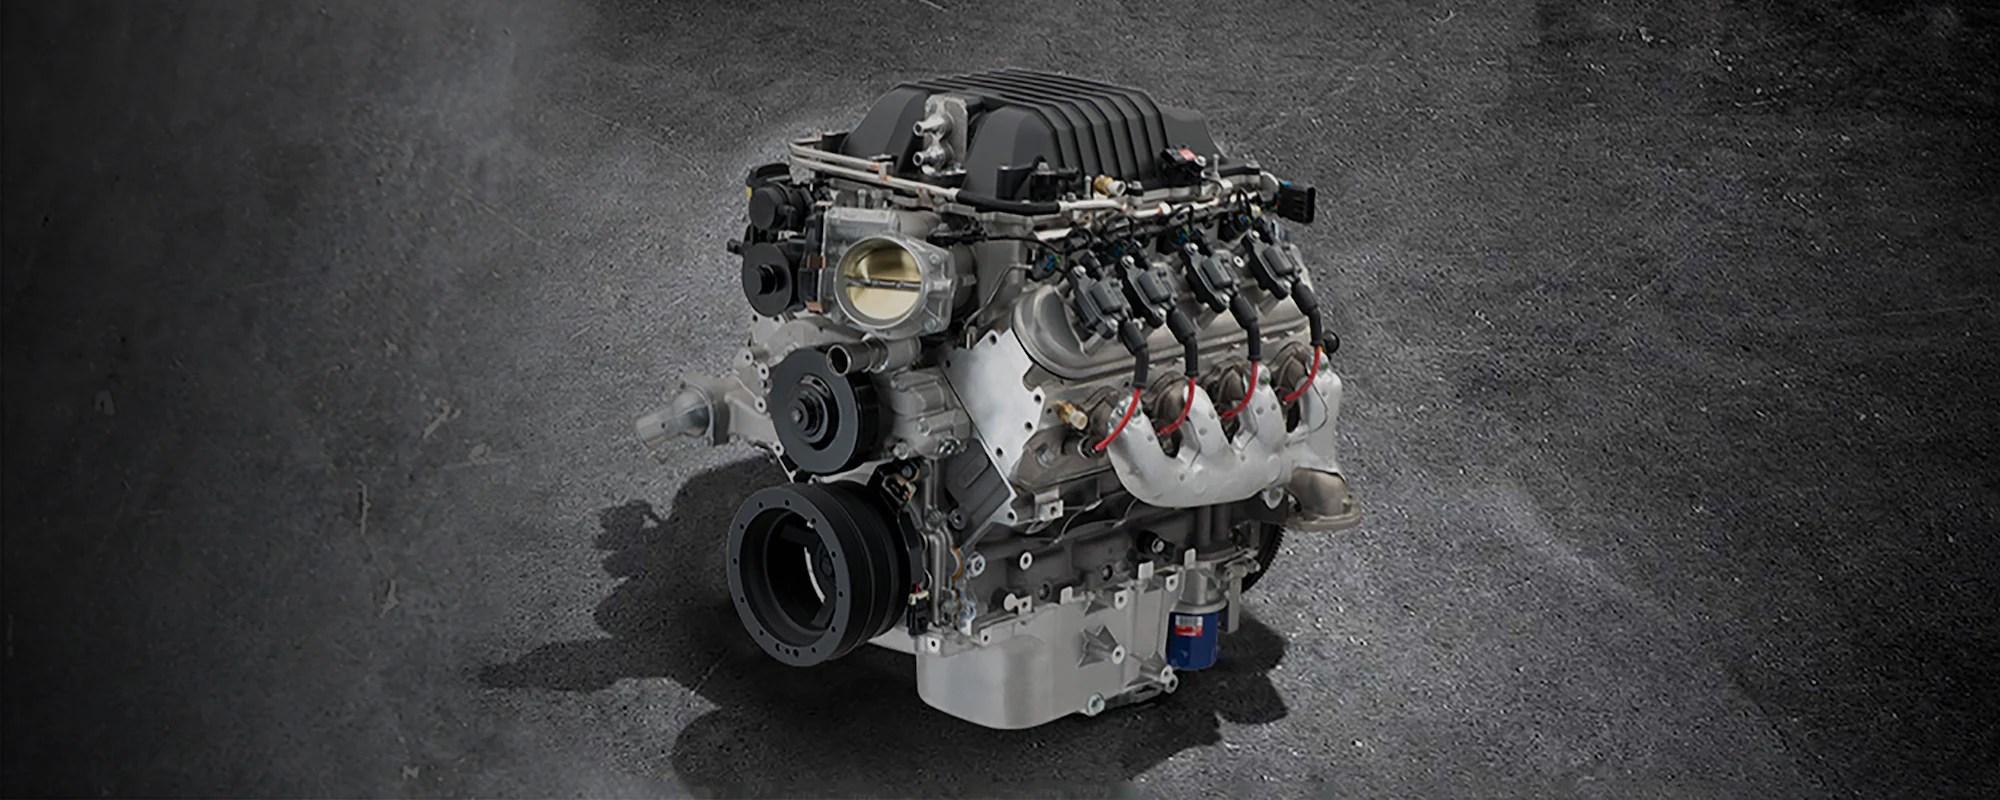 hight resolution of lsa crate engine race chevrolet performancerhchevrolet 5 3 chevy engine internal diagram at innovatehouston